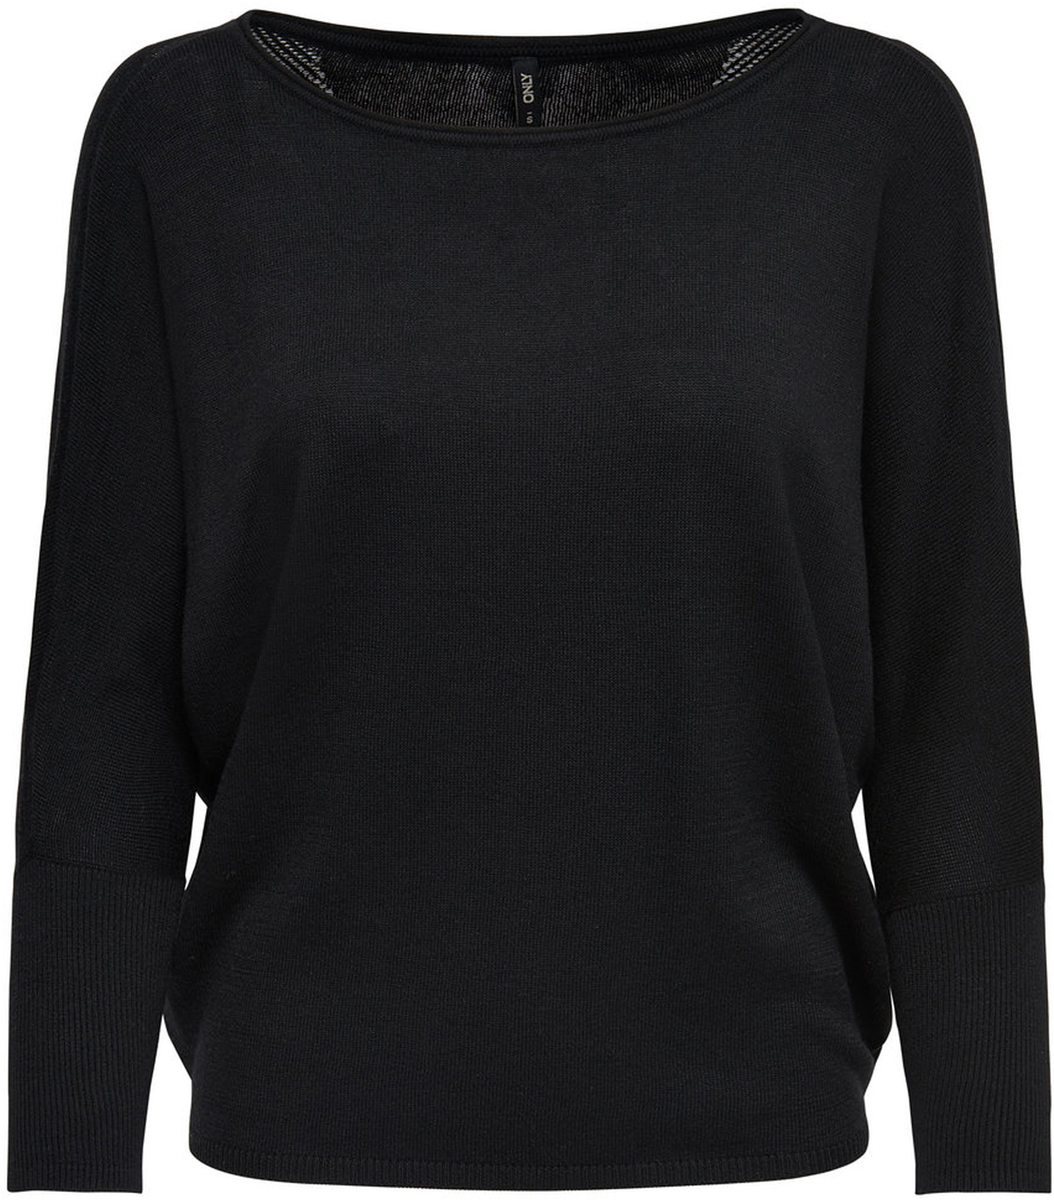 Пуловер жен Only, цвет: черный. 15140104_Black. Размер L (48)15140104_Black